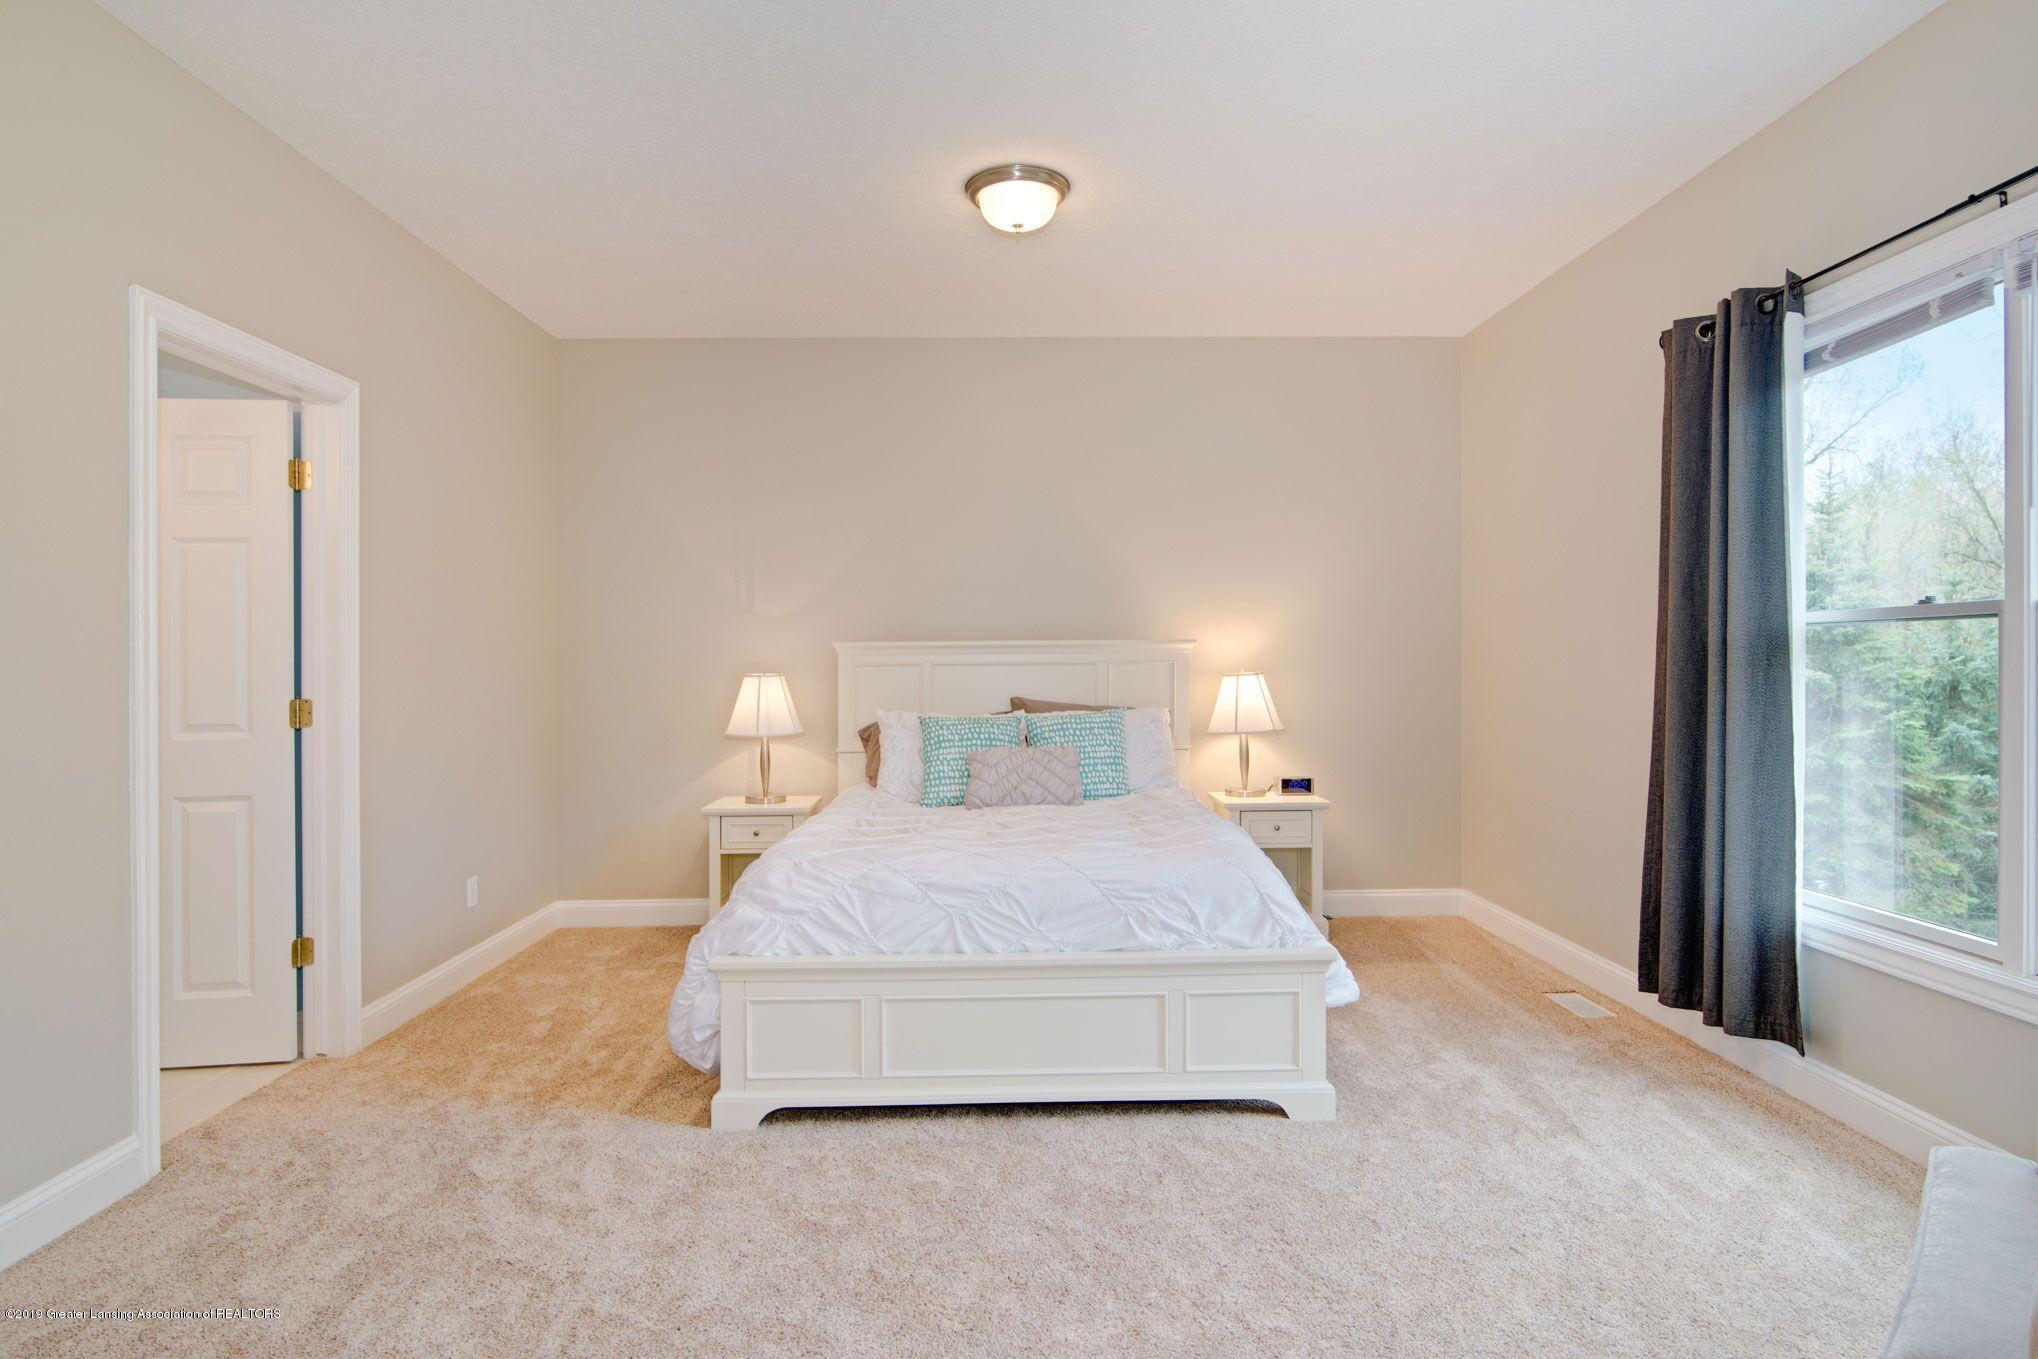 6389 Ridgepond Dr - Bedroom 3 1 - 27